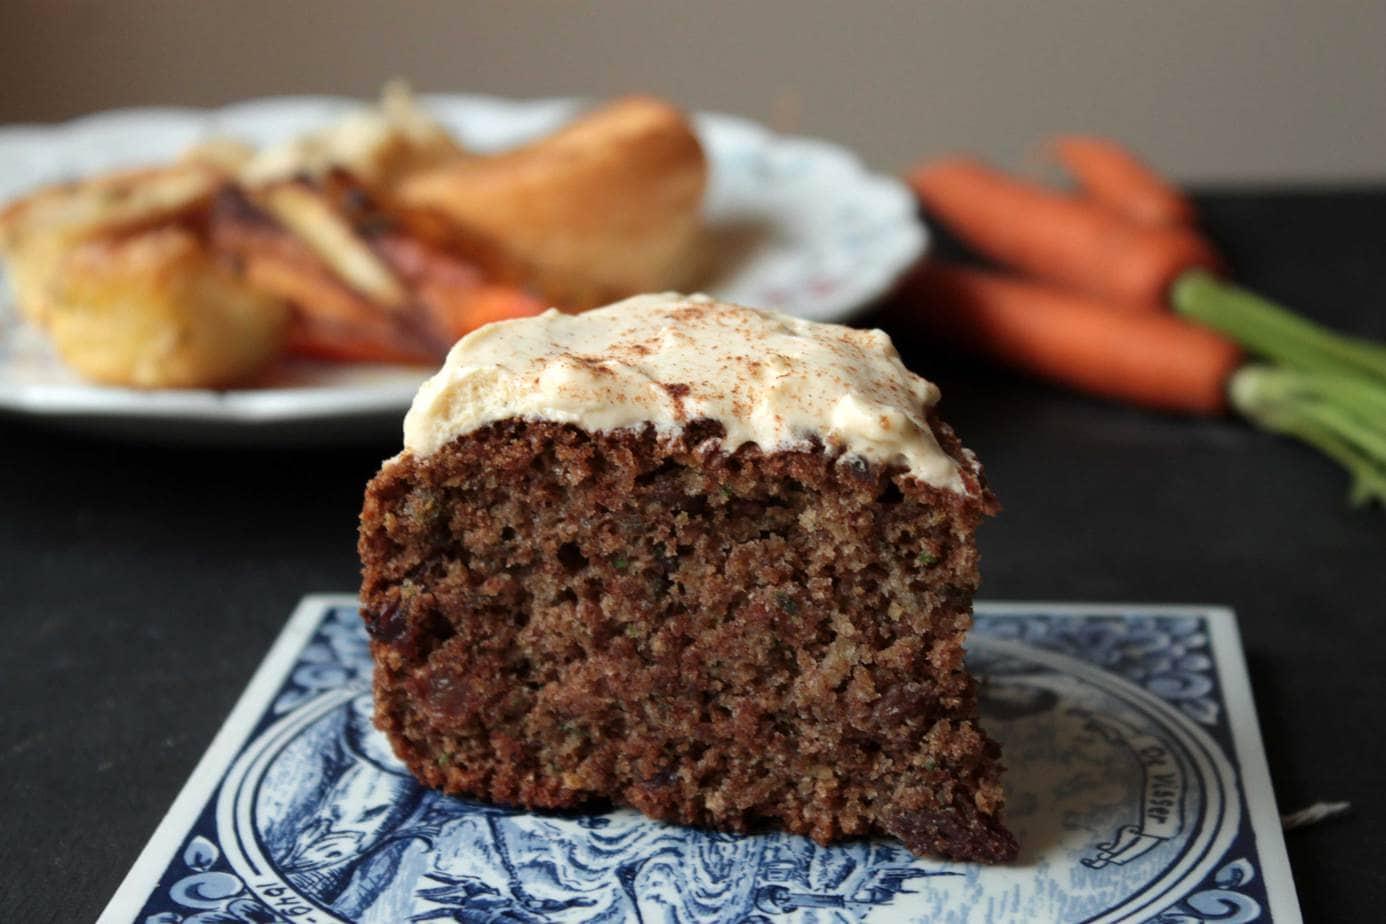 Carrot Cake Recipe Uk No Nuts: Roast Dinner Waste Cake (Maple Cinnamon Cake With Carrot